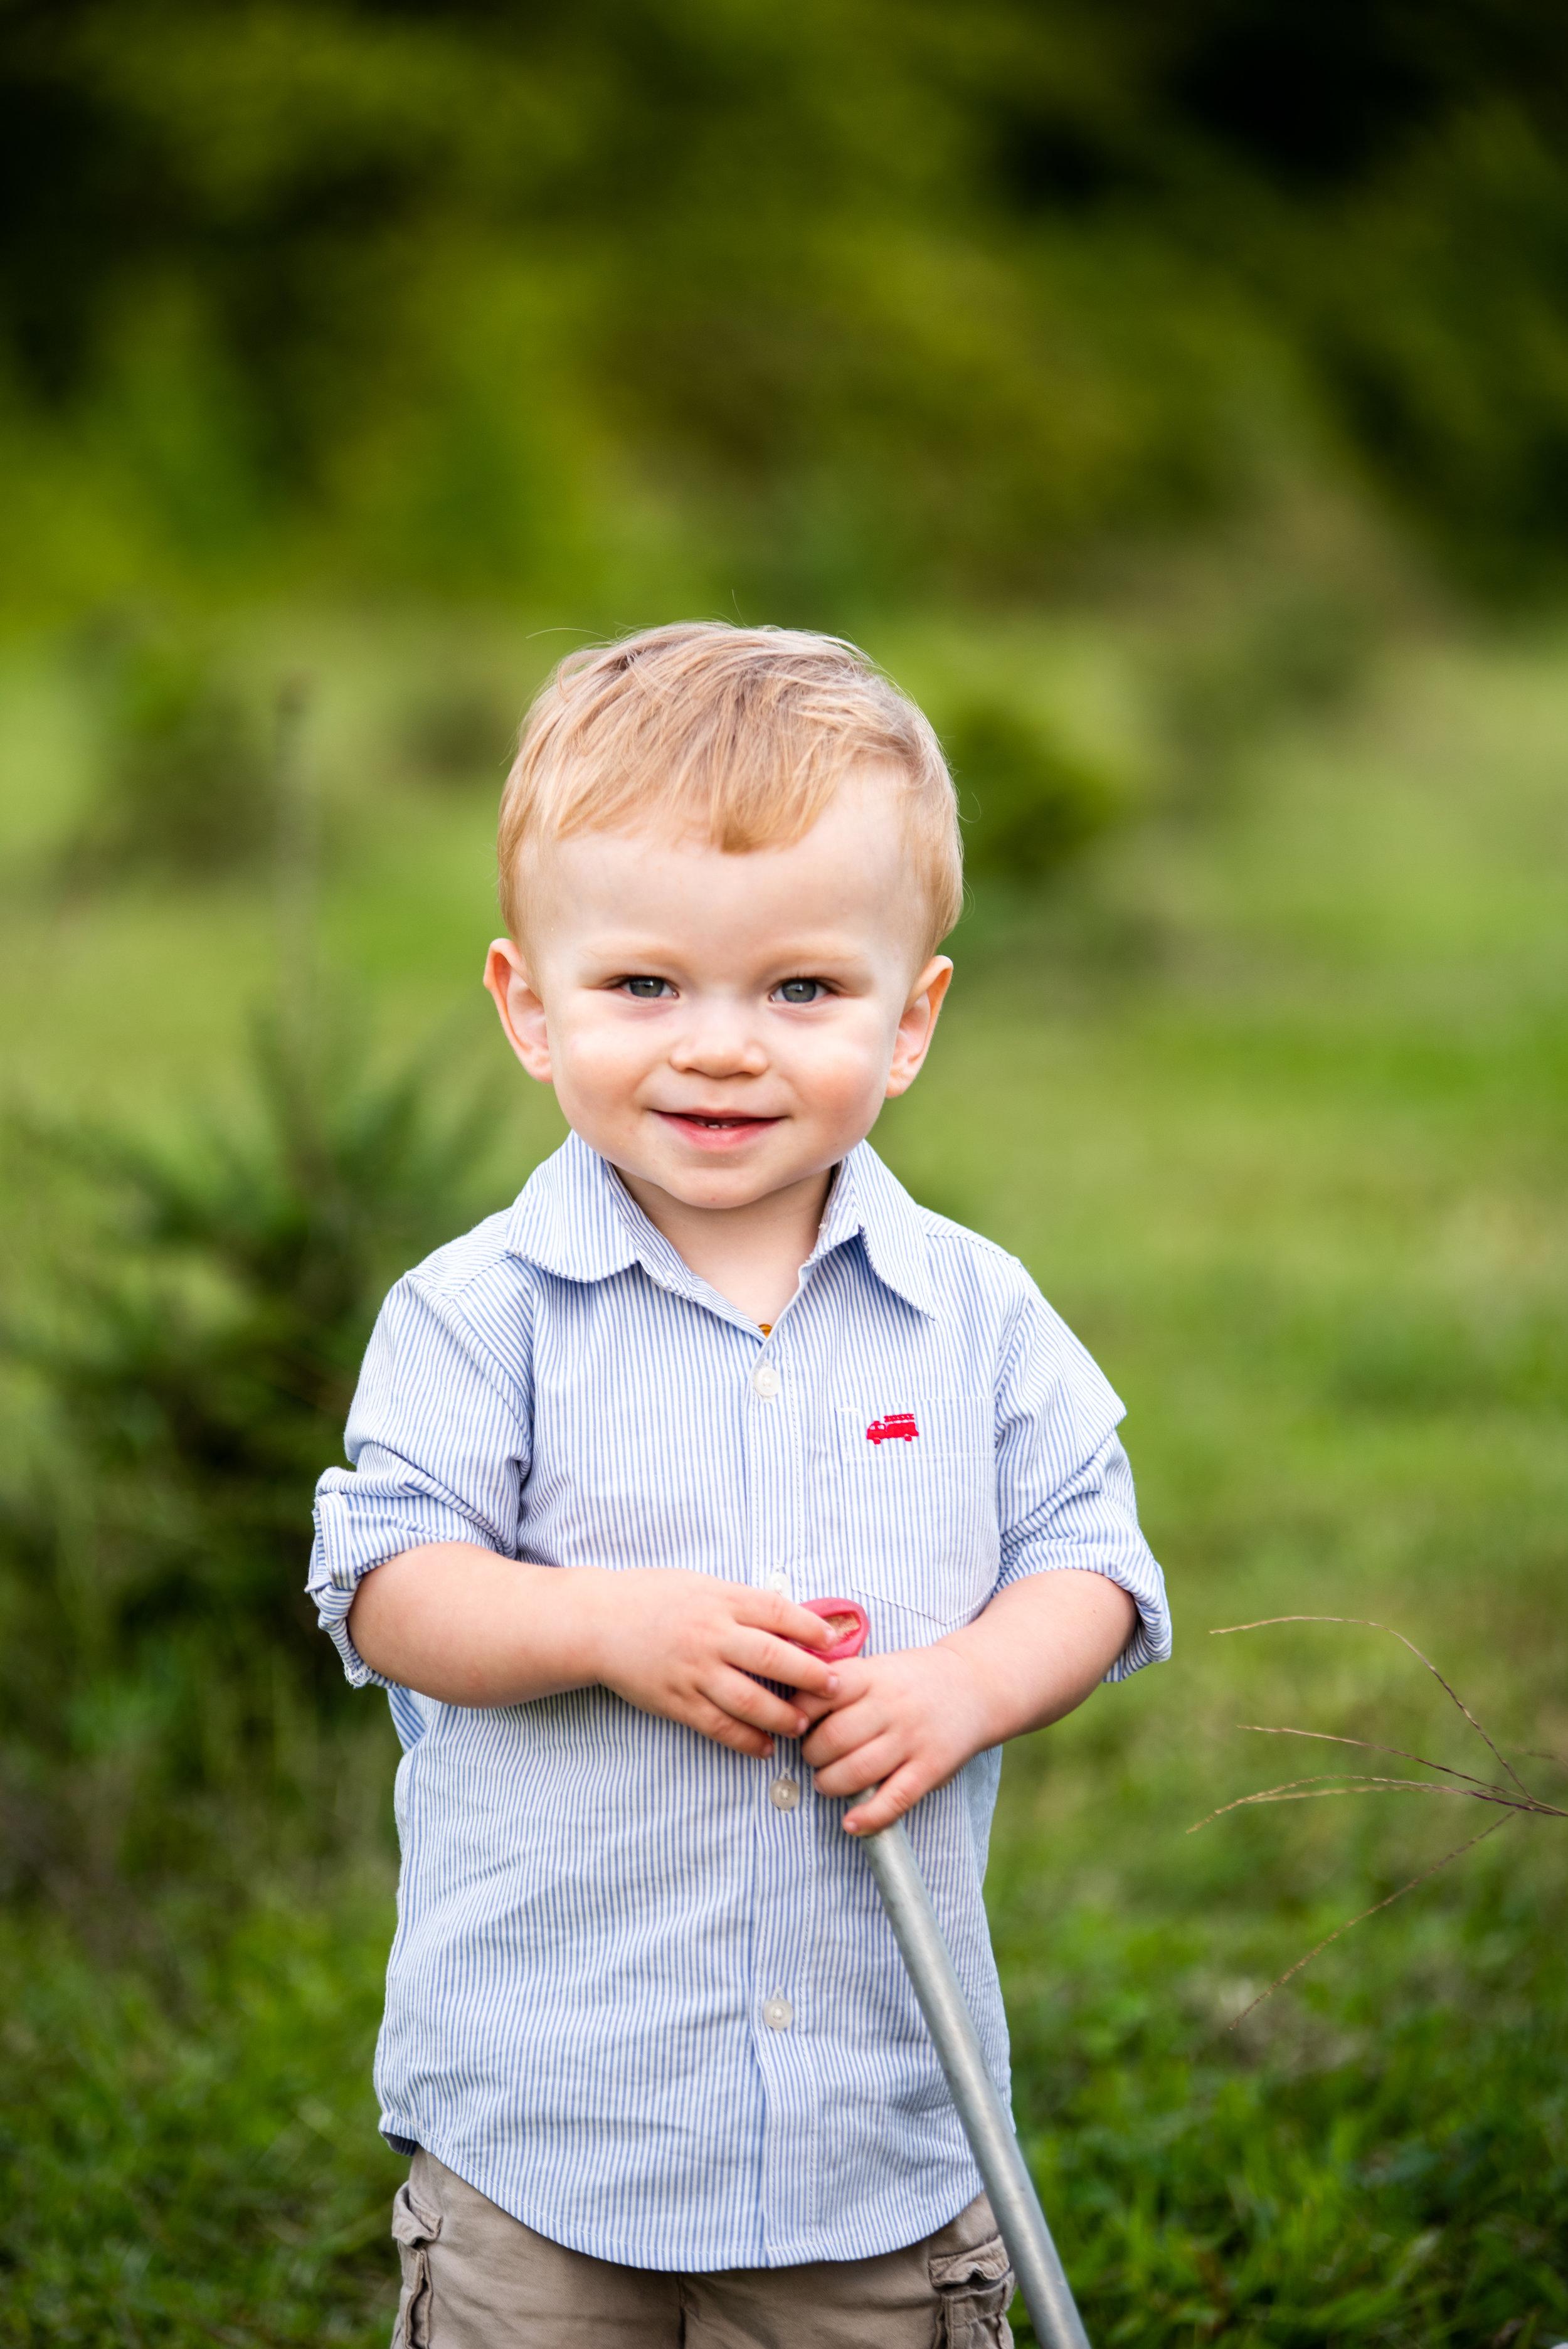 Kyla Jo Photography Muncie Indiana Family Photos Whitetail tree Farm Kid Children Photographer